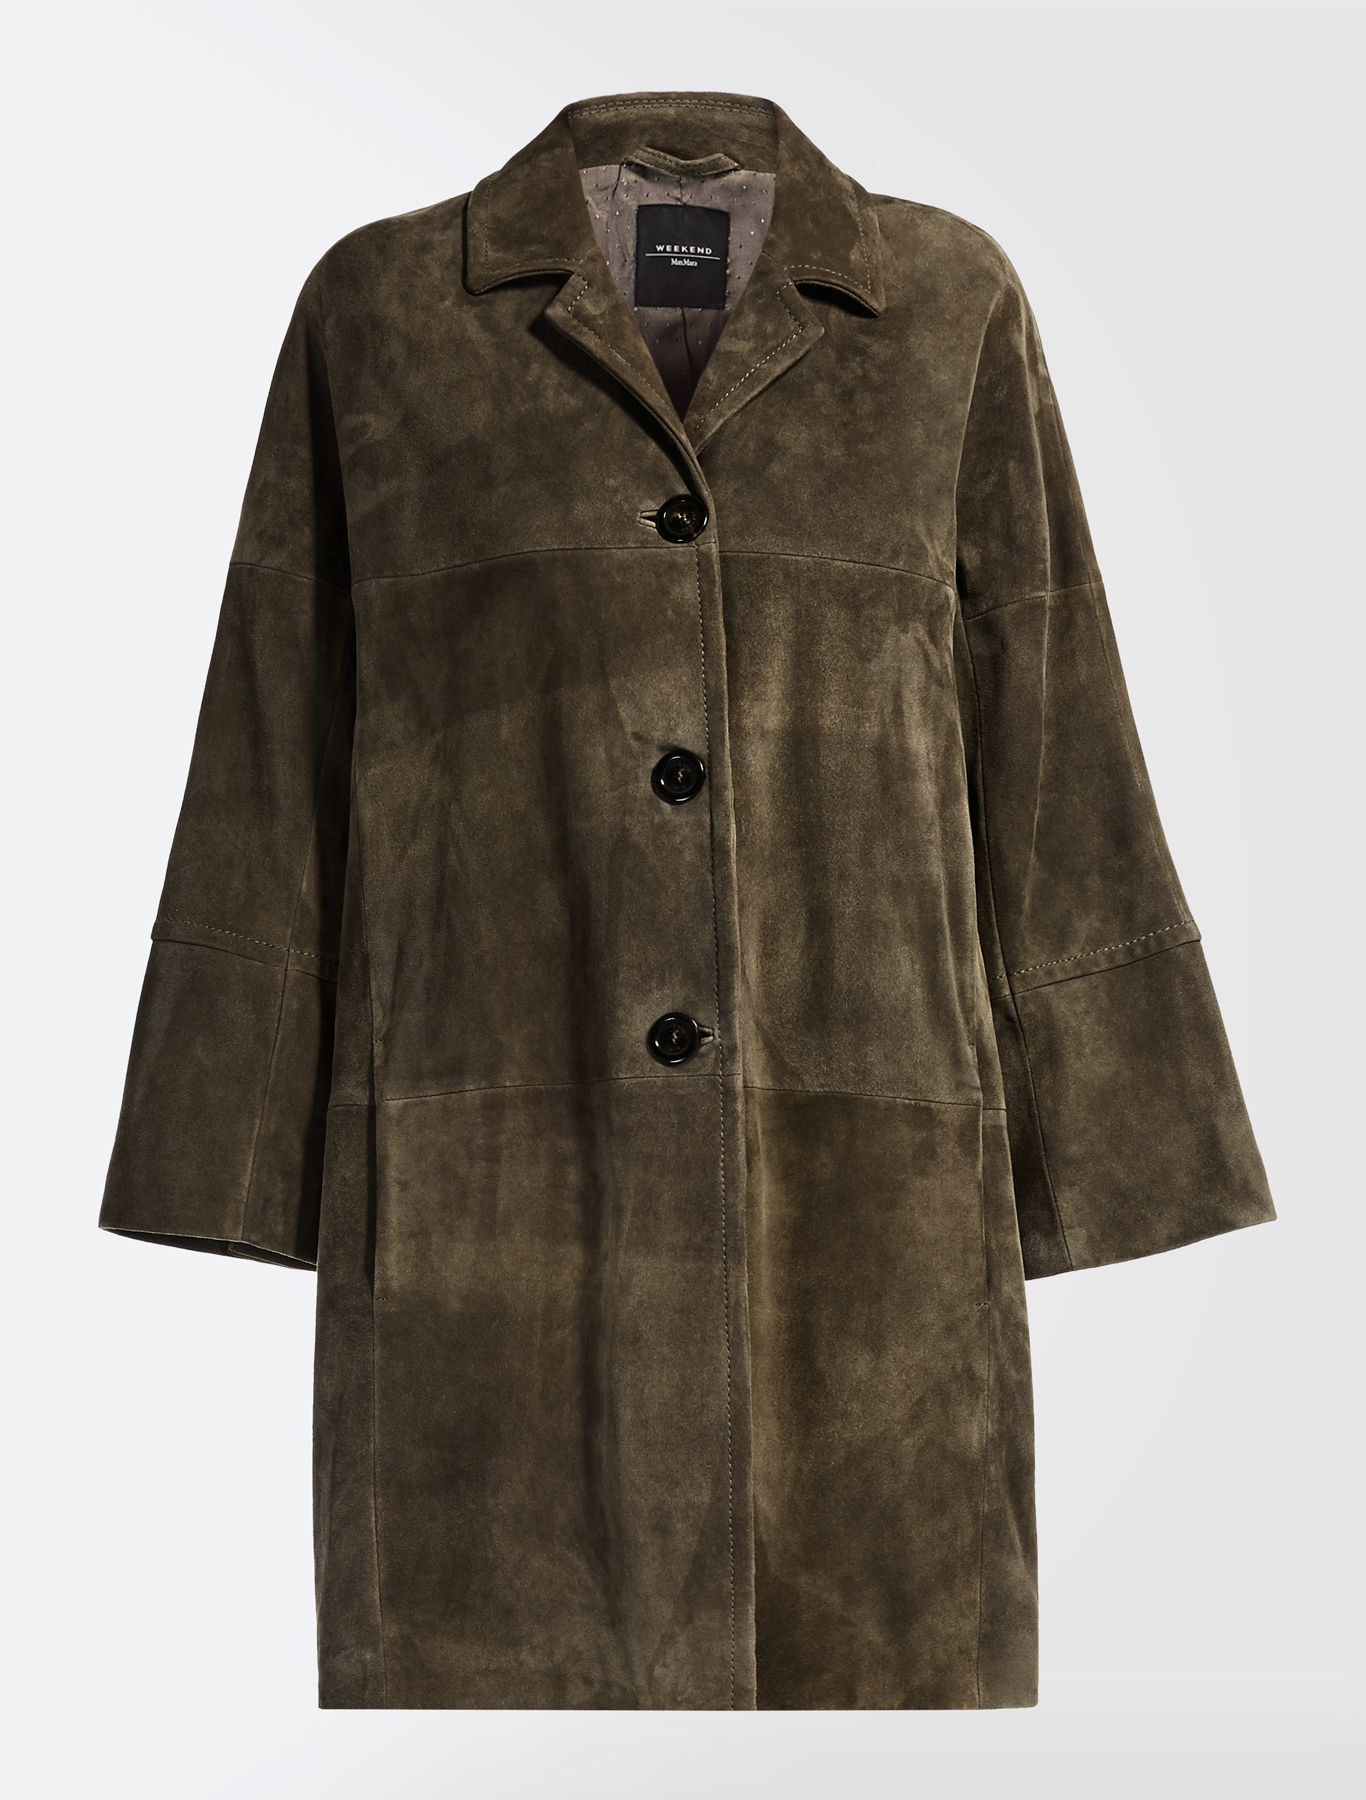 Suede leather duster coat, kaki